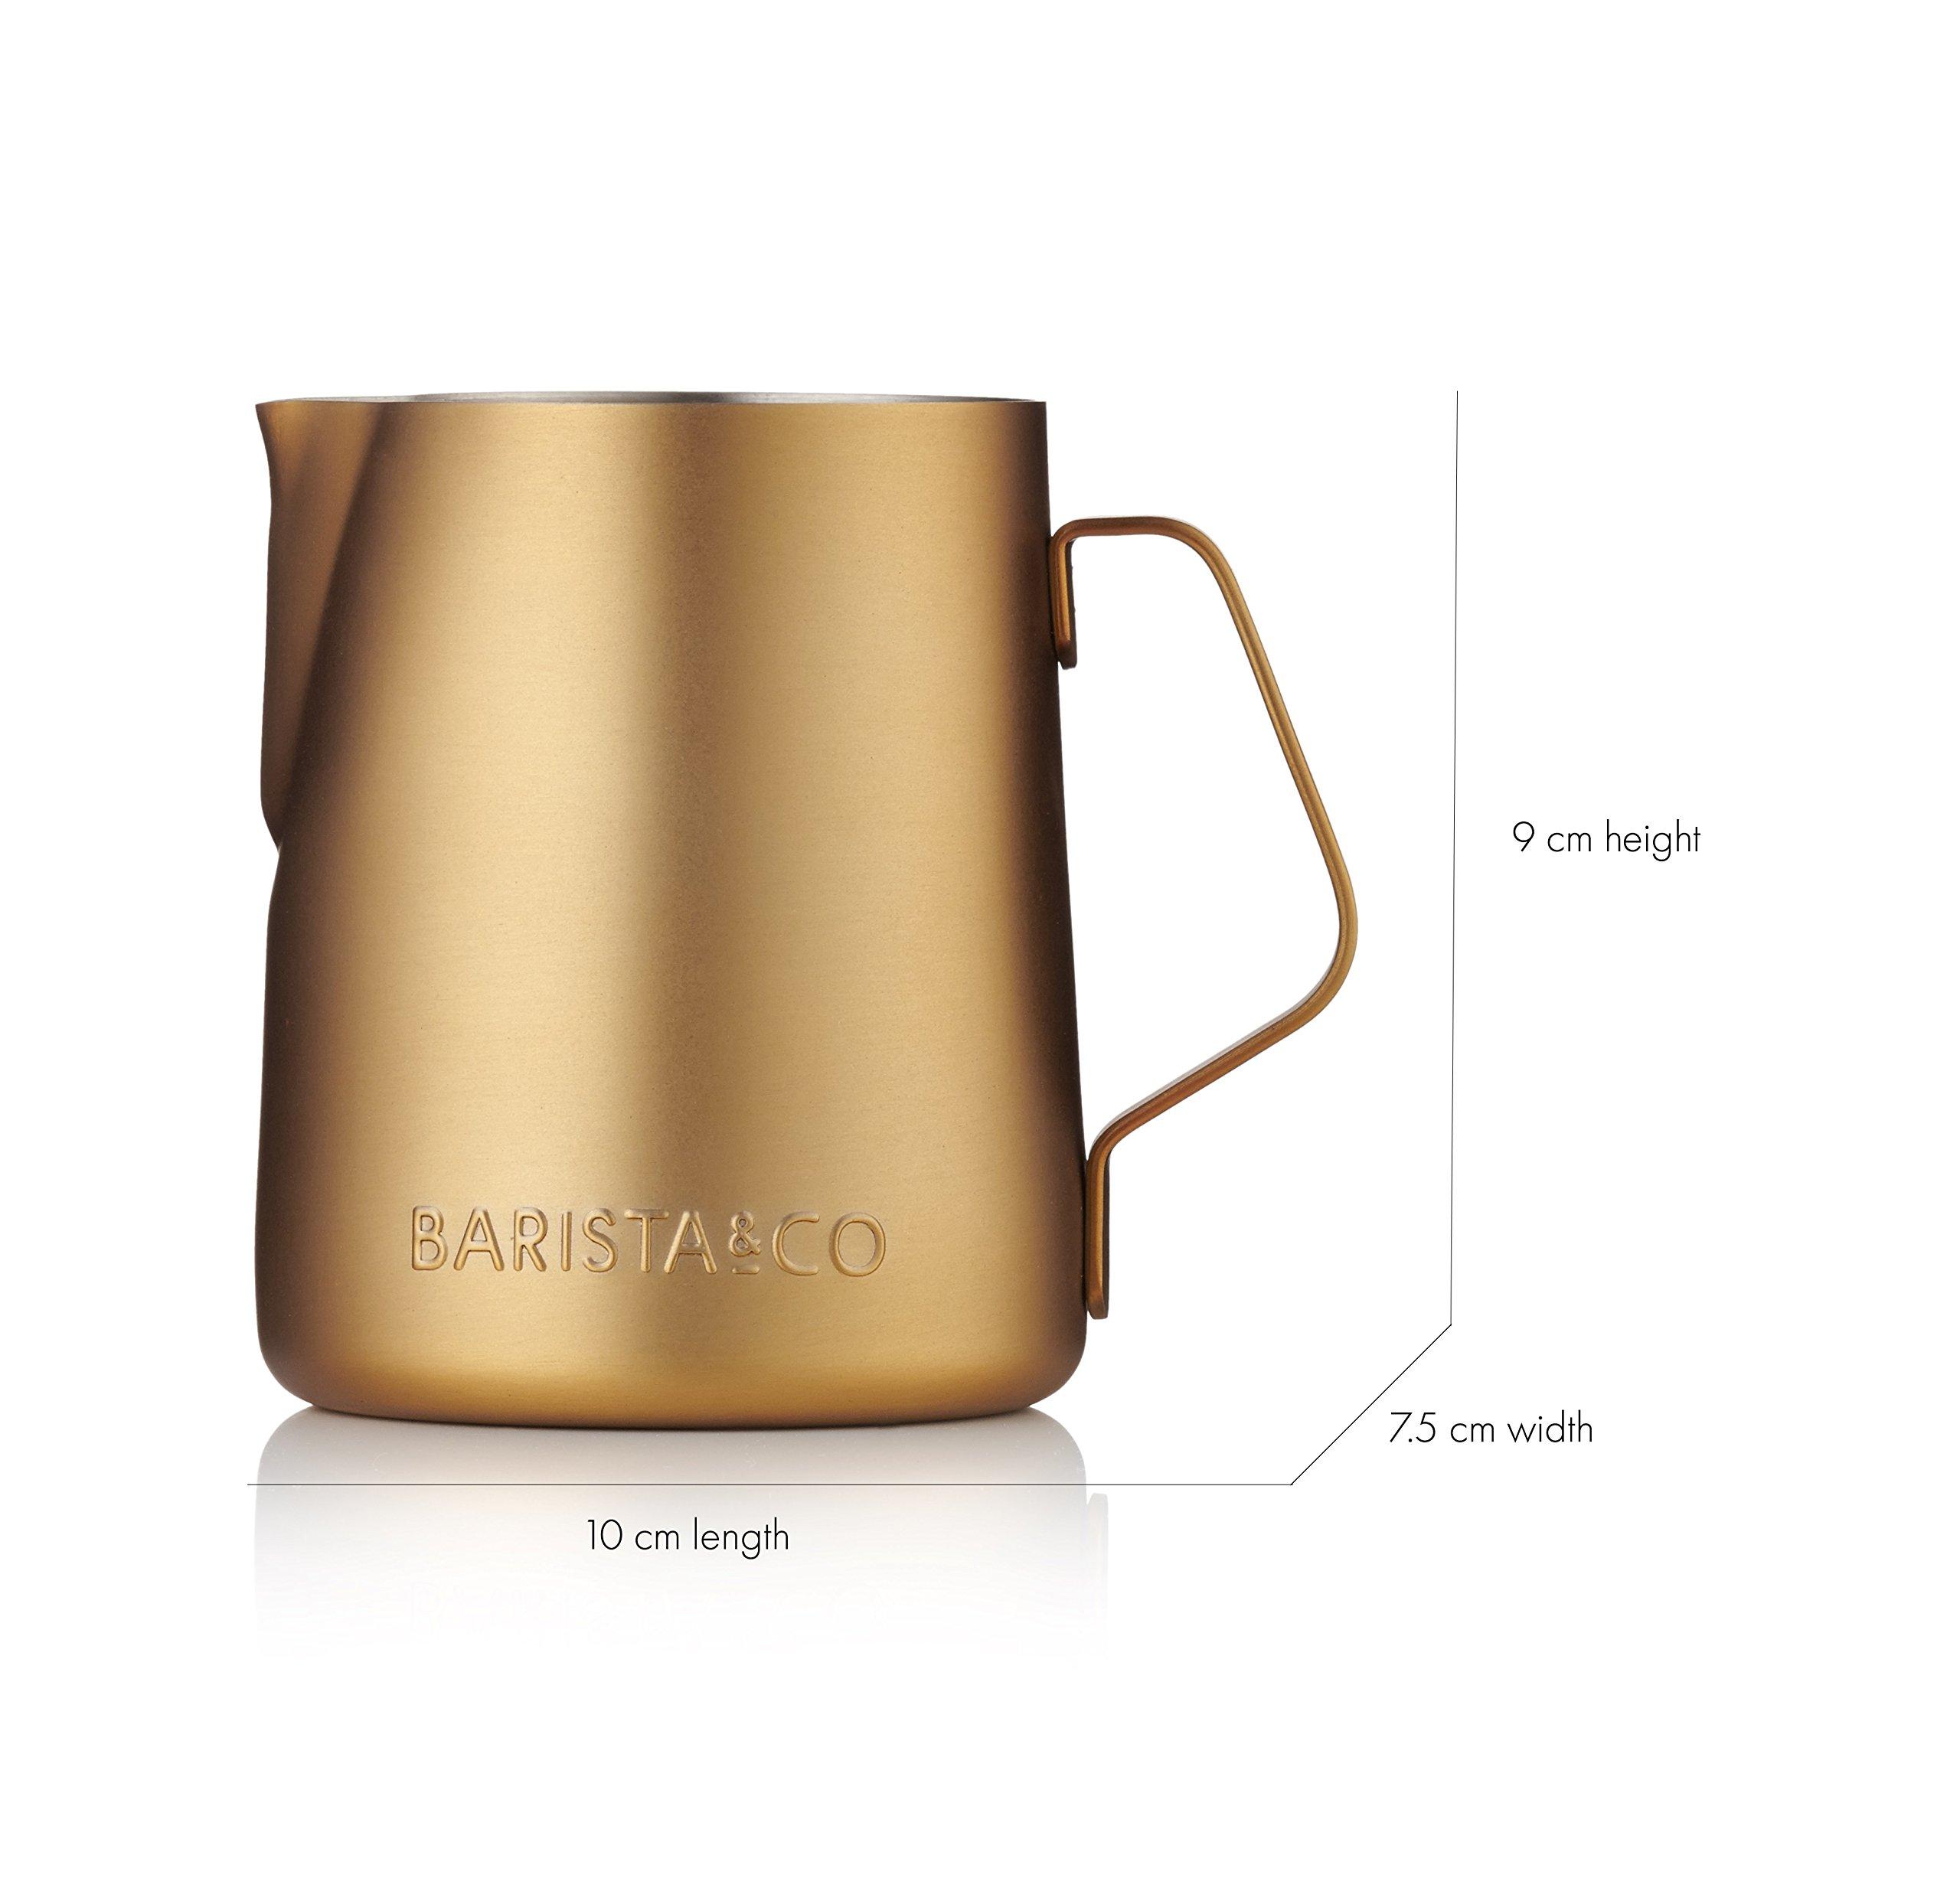 Barista & Co Milk Jug, Midnight Gold by Barista (Image #3)